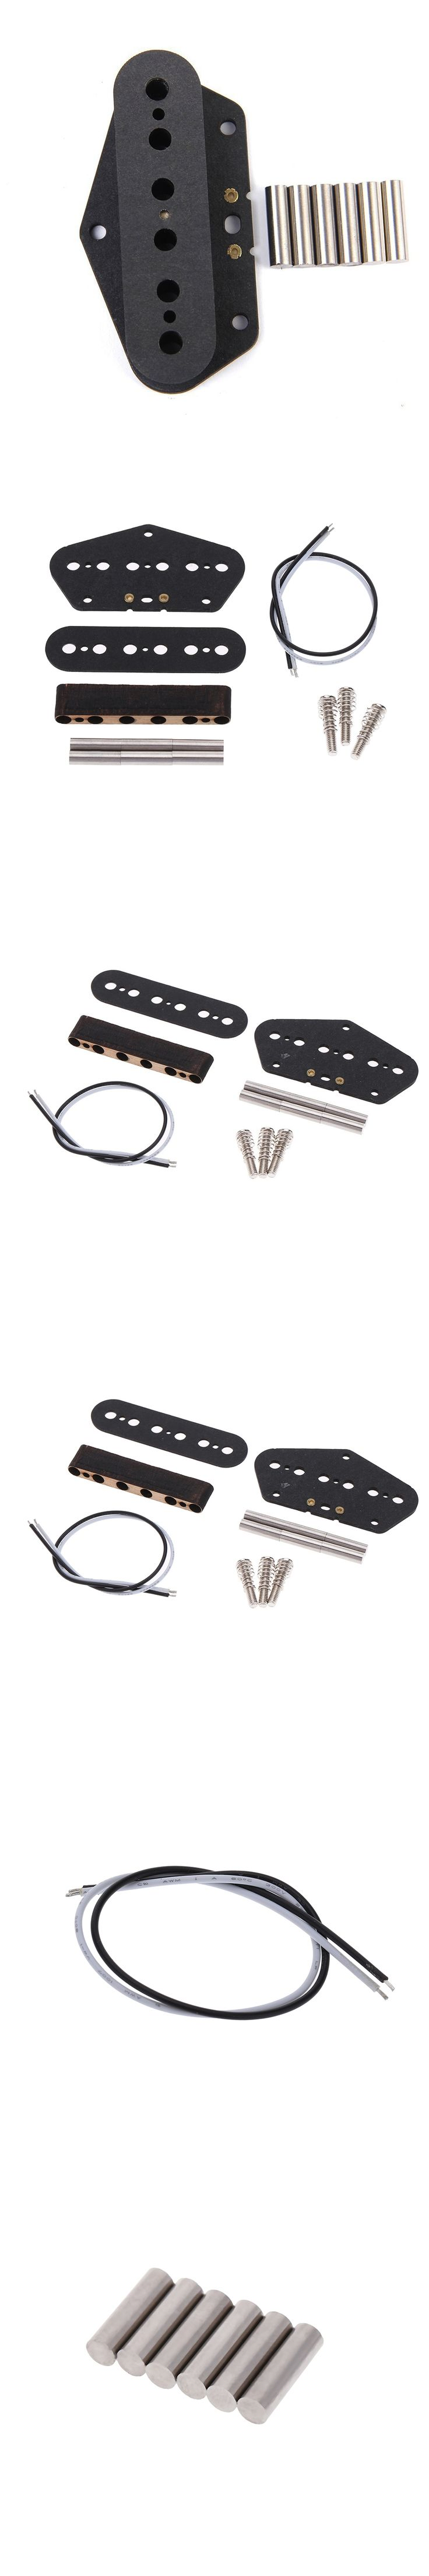 New Arrival A Set Fiber Plate Guitar Pickup Bobbin Stagger With 6pcs Magnetic Bar Guitar Pickup Kits Guitar Accessories